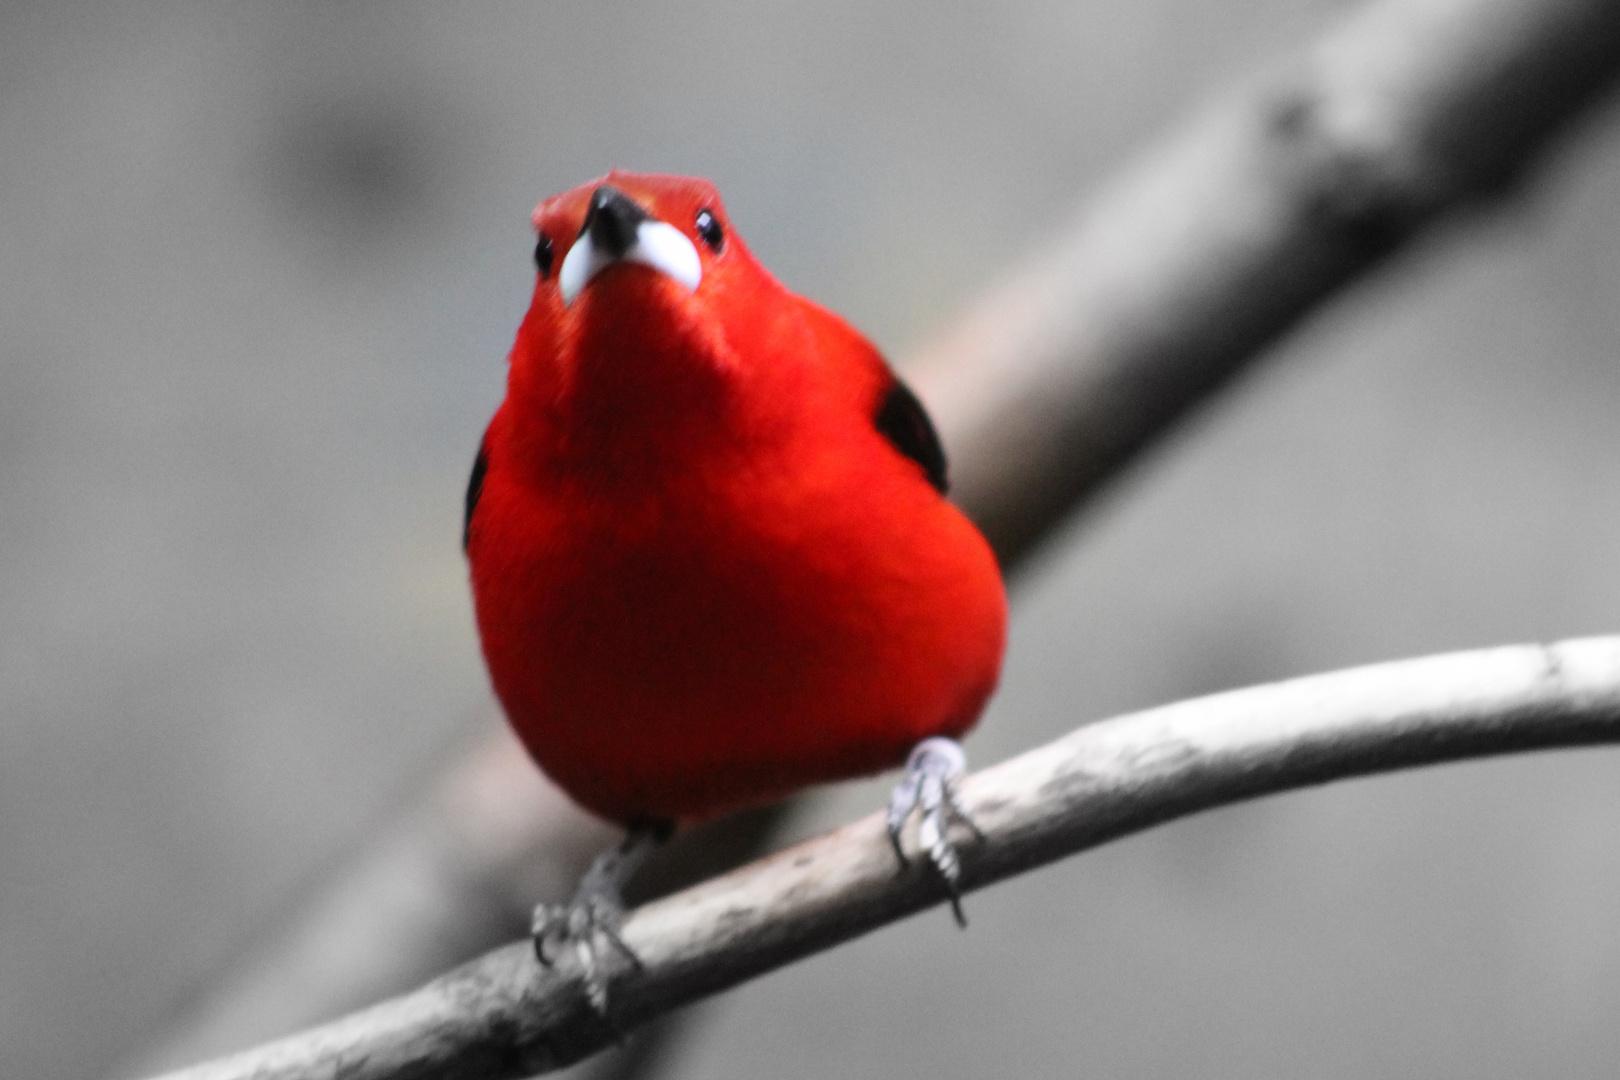 roter vogel foto bild tiere zoo wildpark falknerei v gel bilder auf fotocommunity. Black Bedroom Furniture Sets. Home Design Ideas